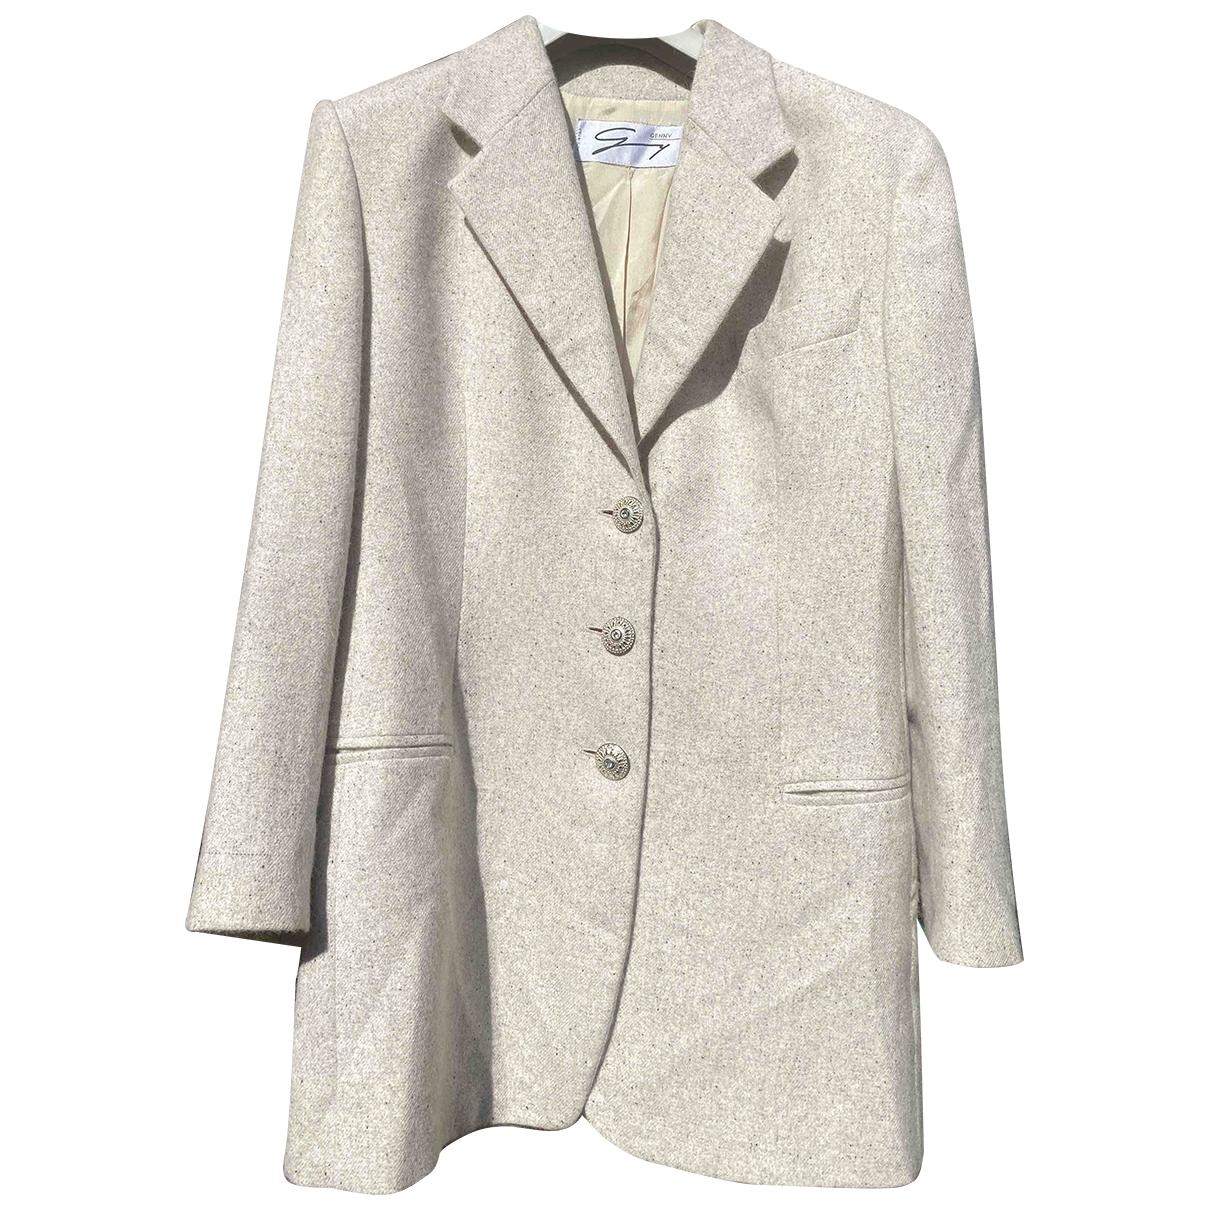 Genny \N Jacke in  Grau Wolle